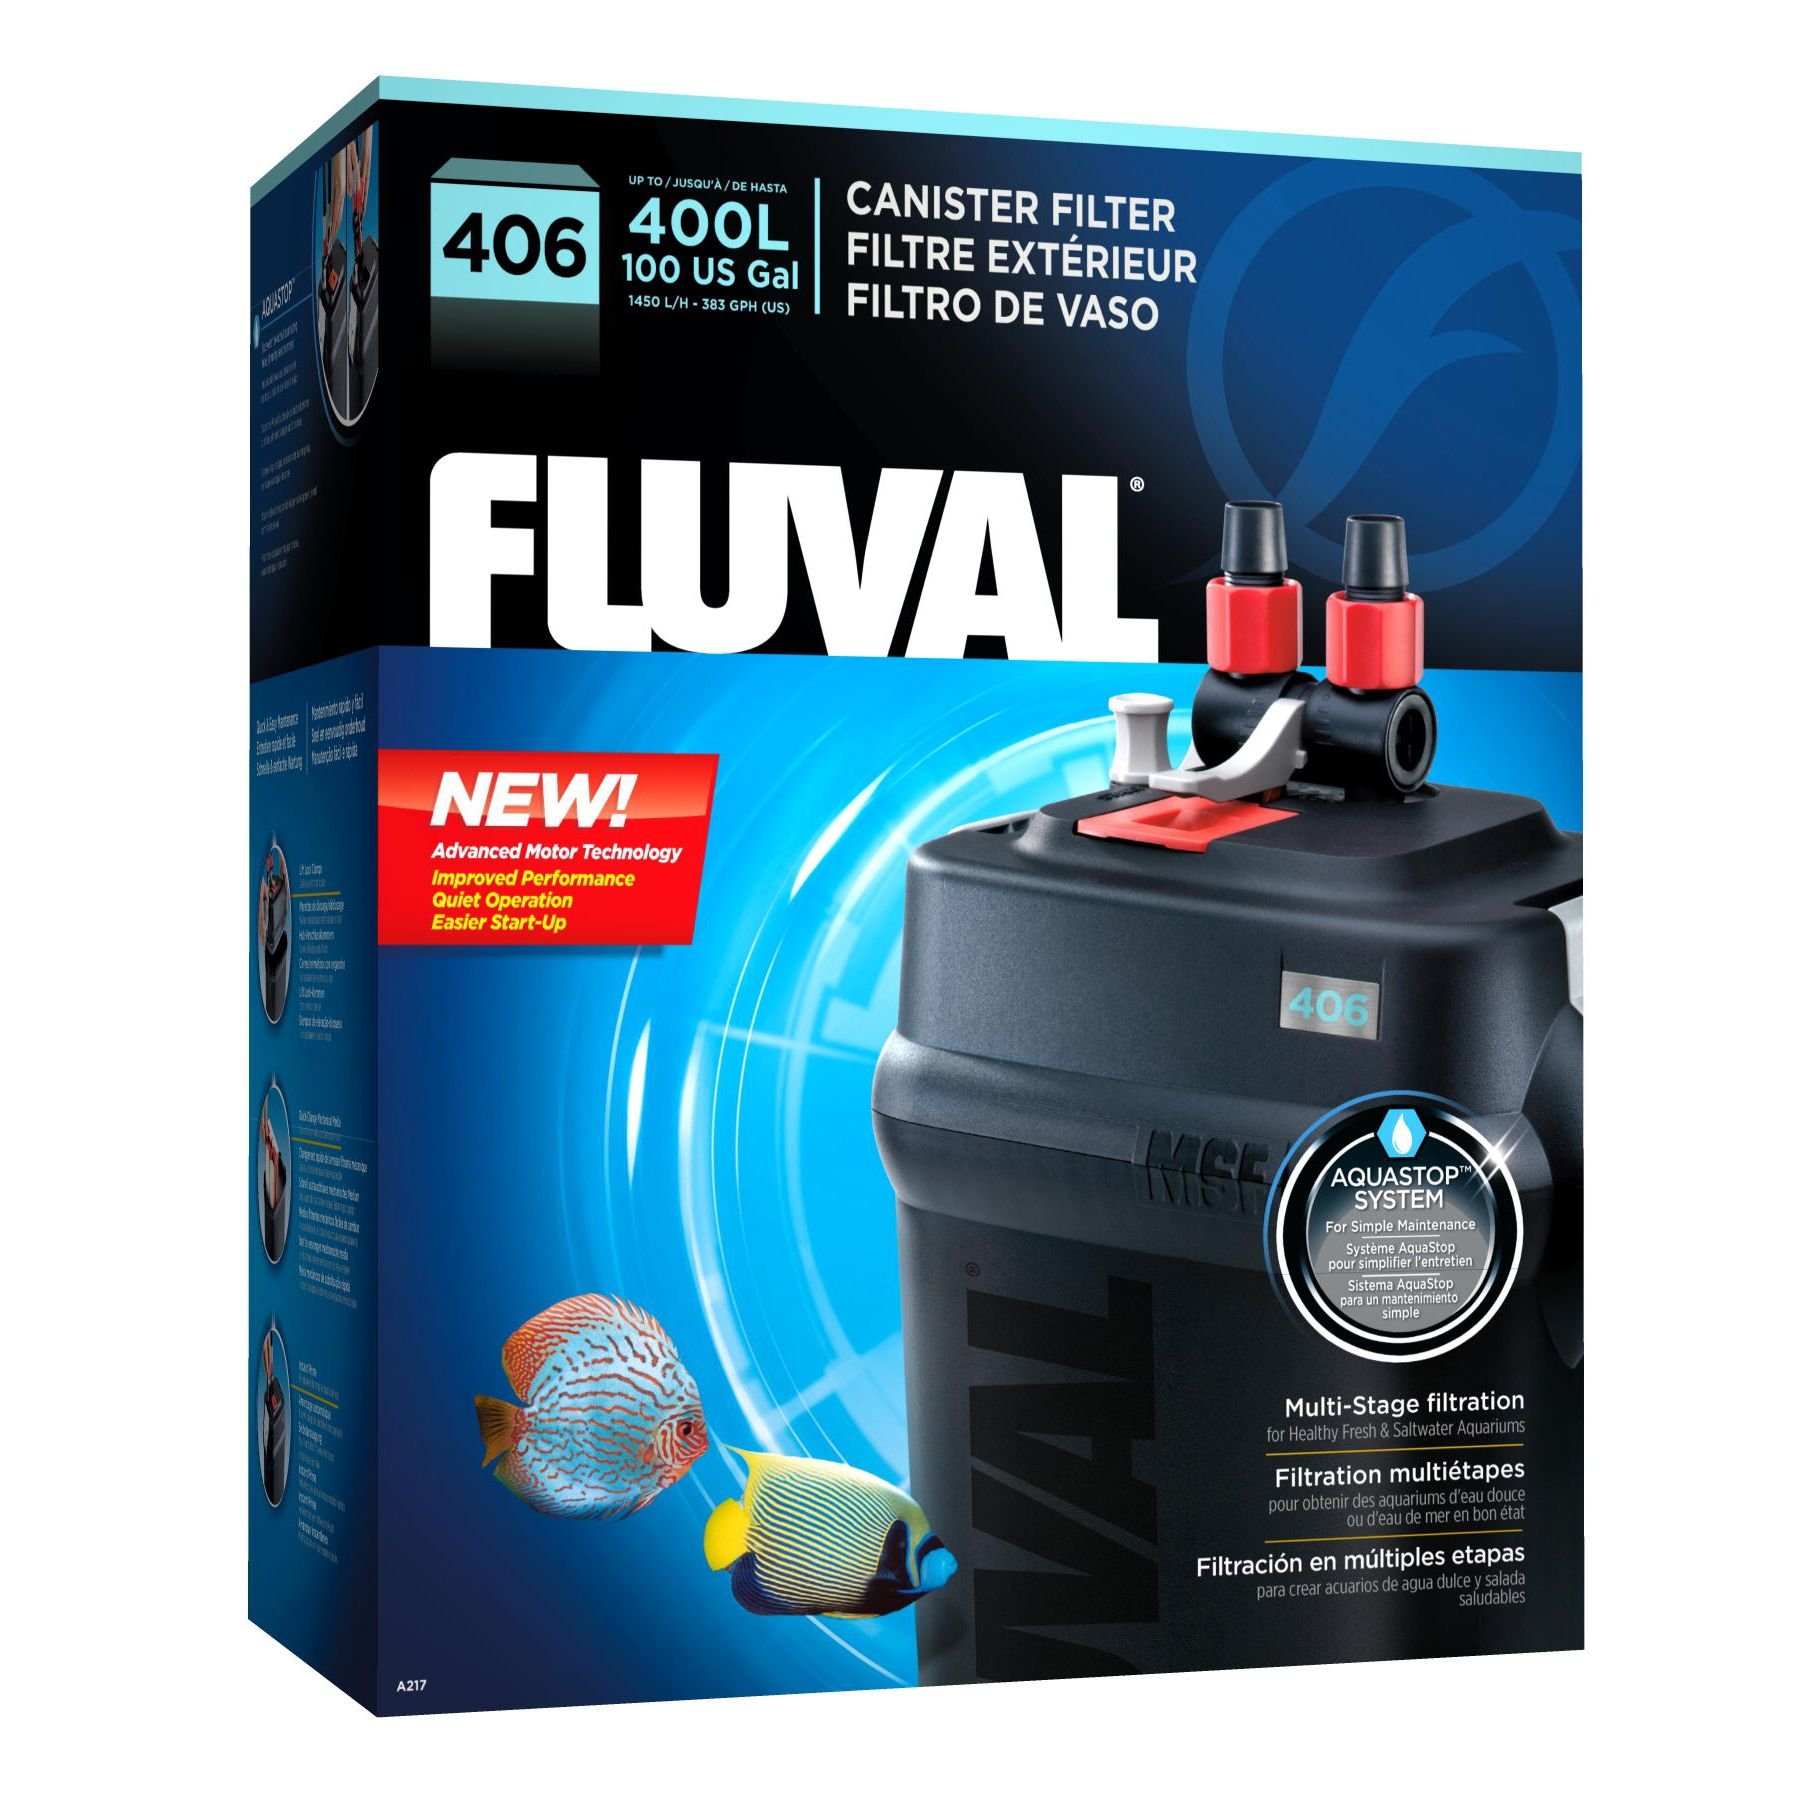 Filter & Pumps